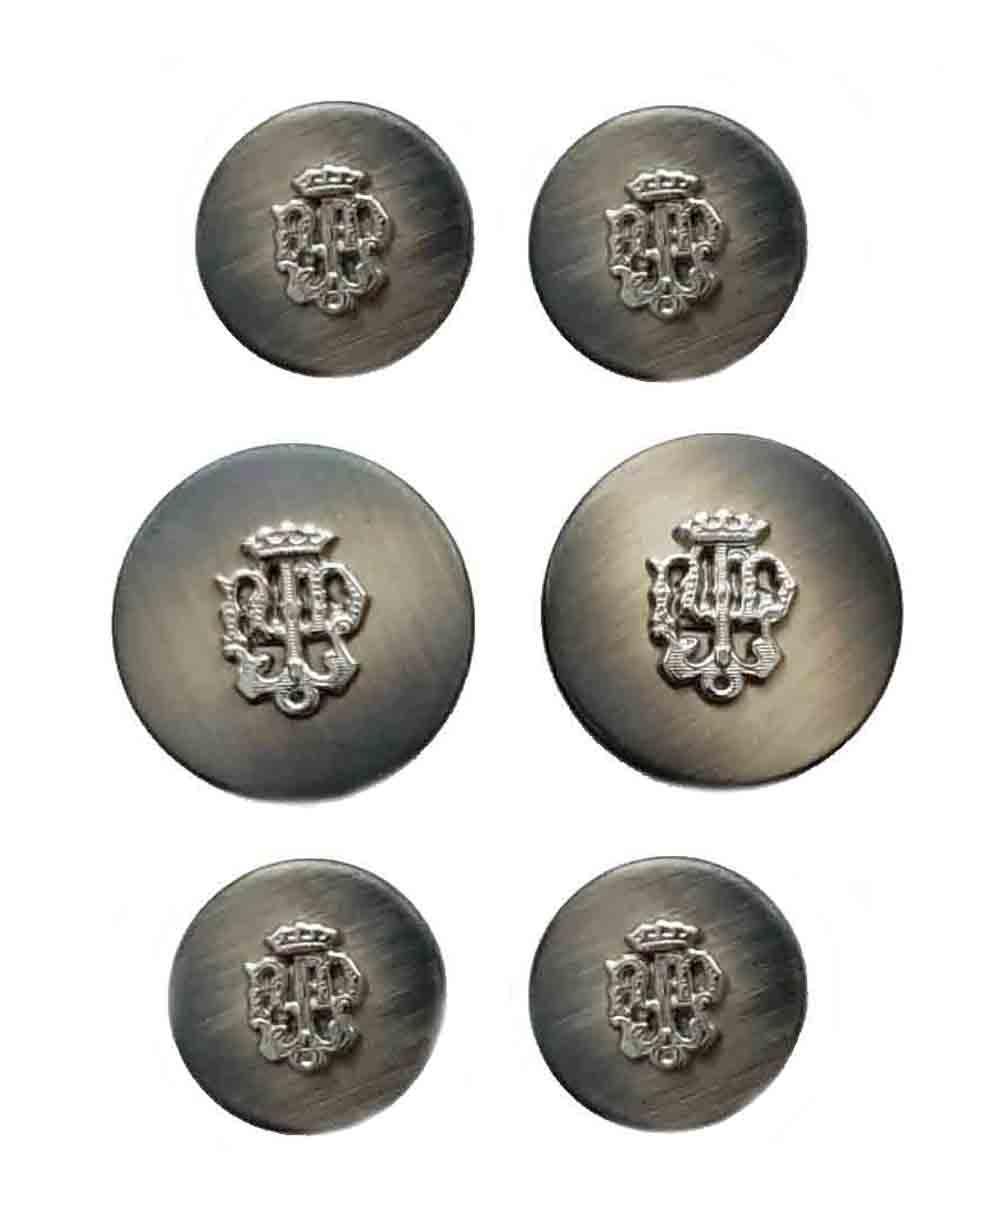 Vintage Aquascutum Blazer Buttons Set Gray Gold Crown Ornate Detailing Metal Shank Men's